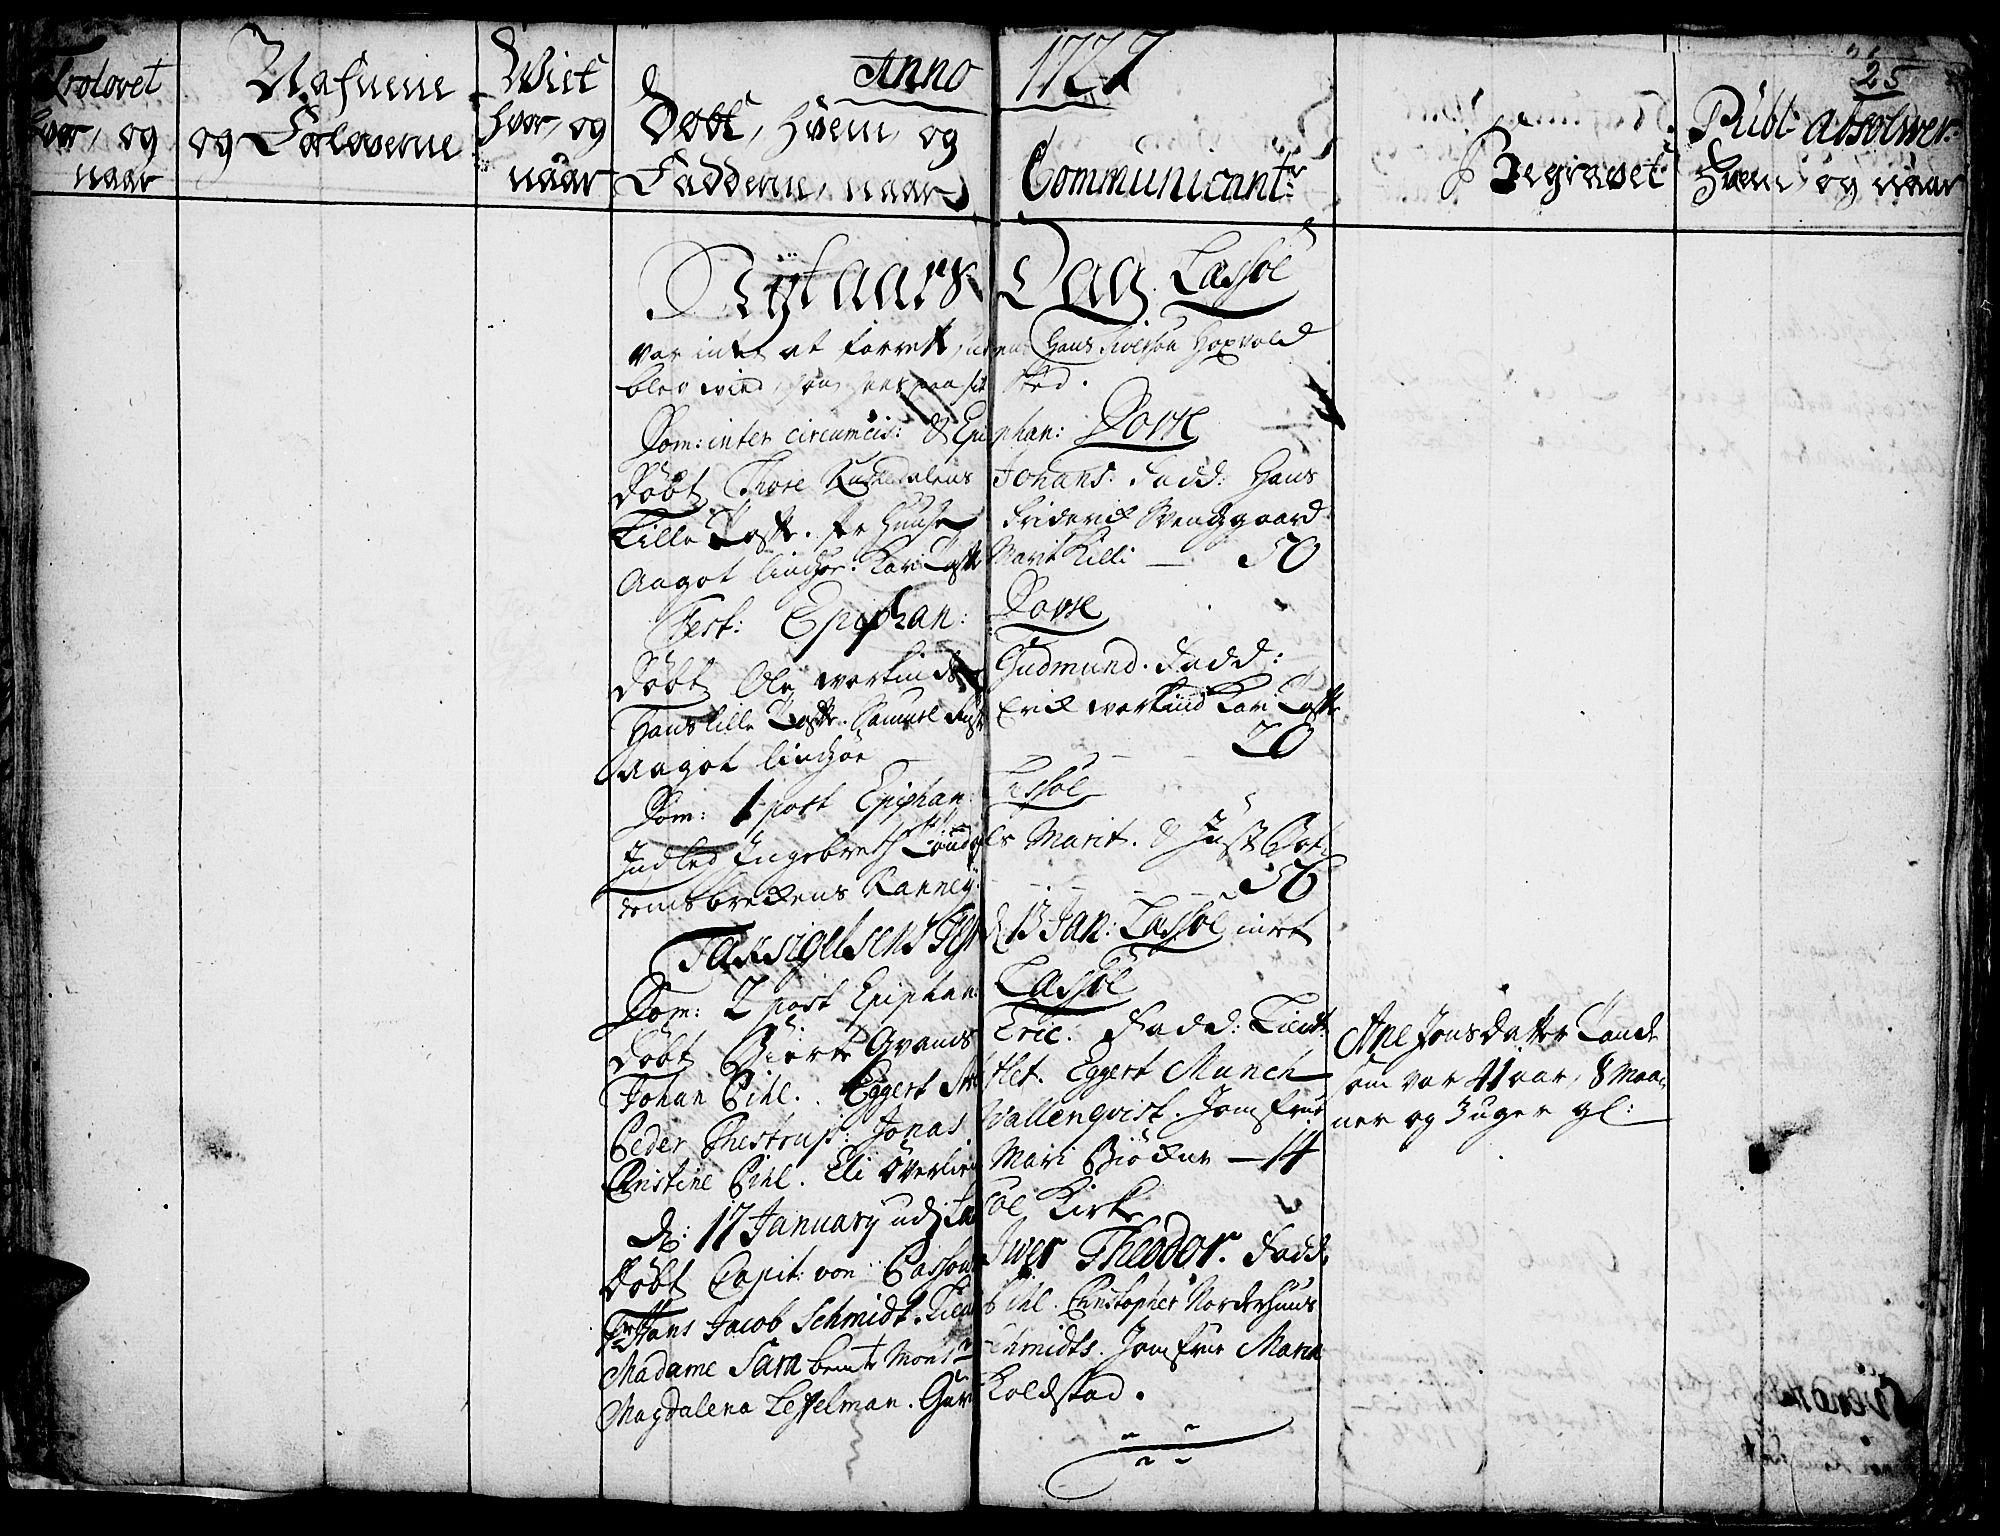 SAH, Lesja prestekontor, Ministerialbok nr. 1, 1724-1731, s. 25